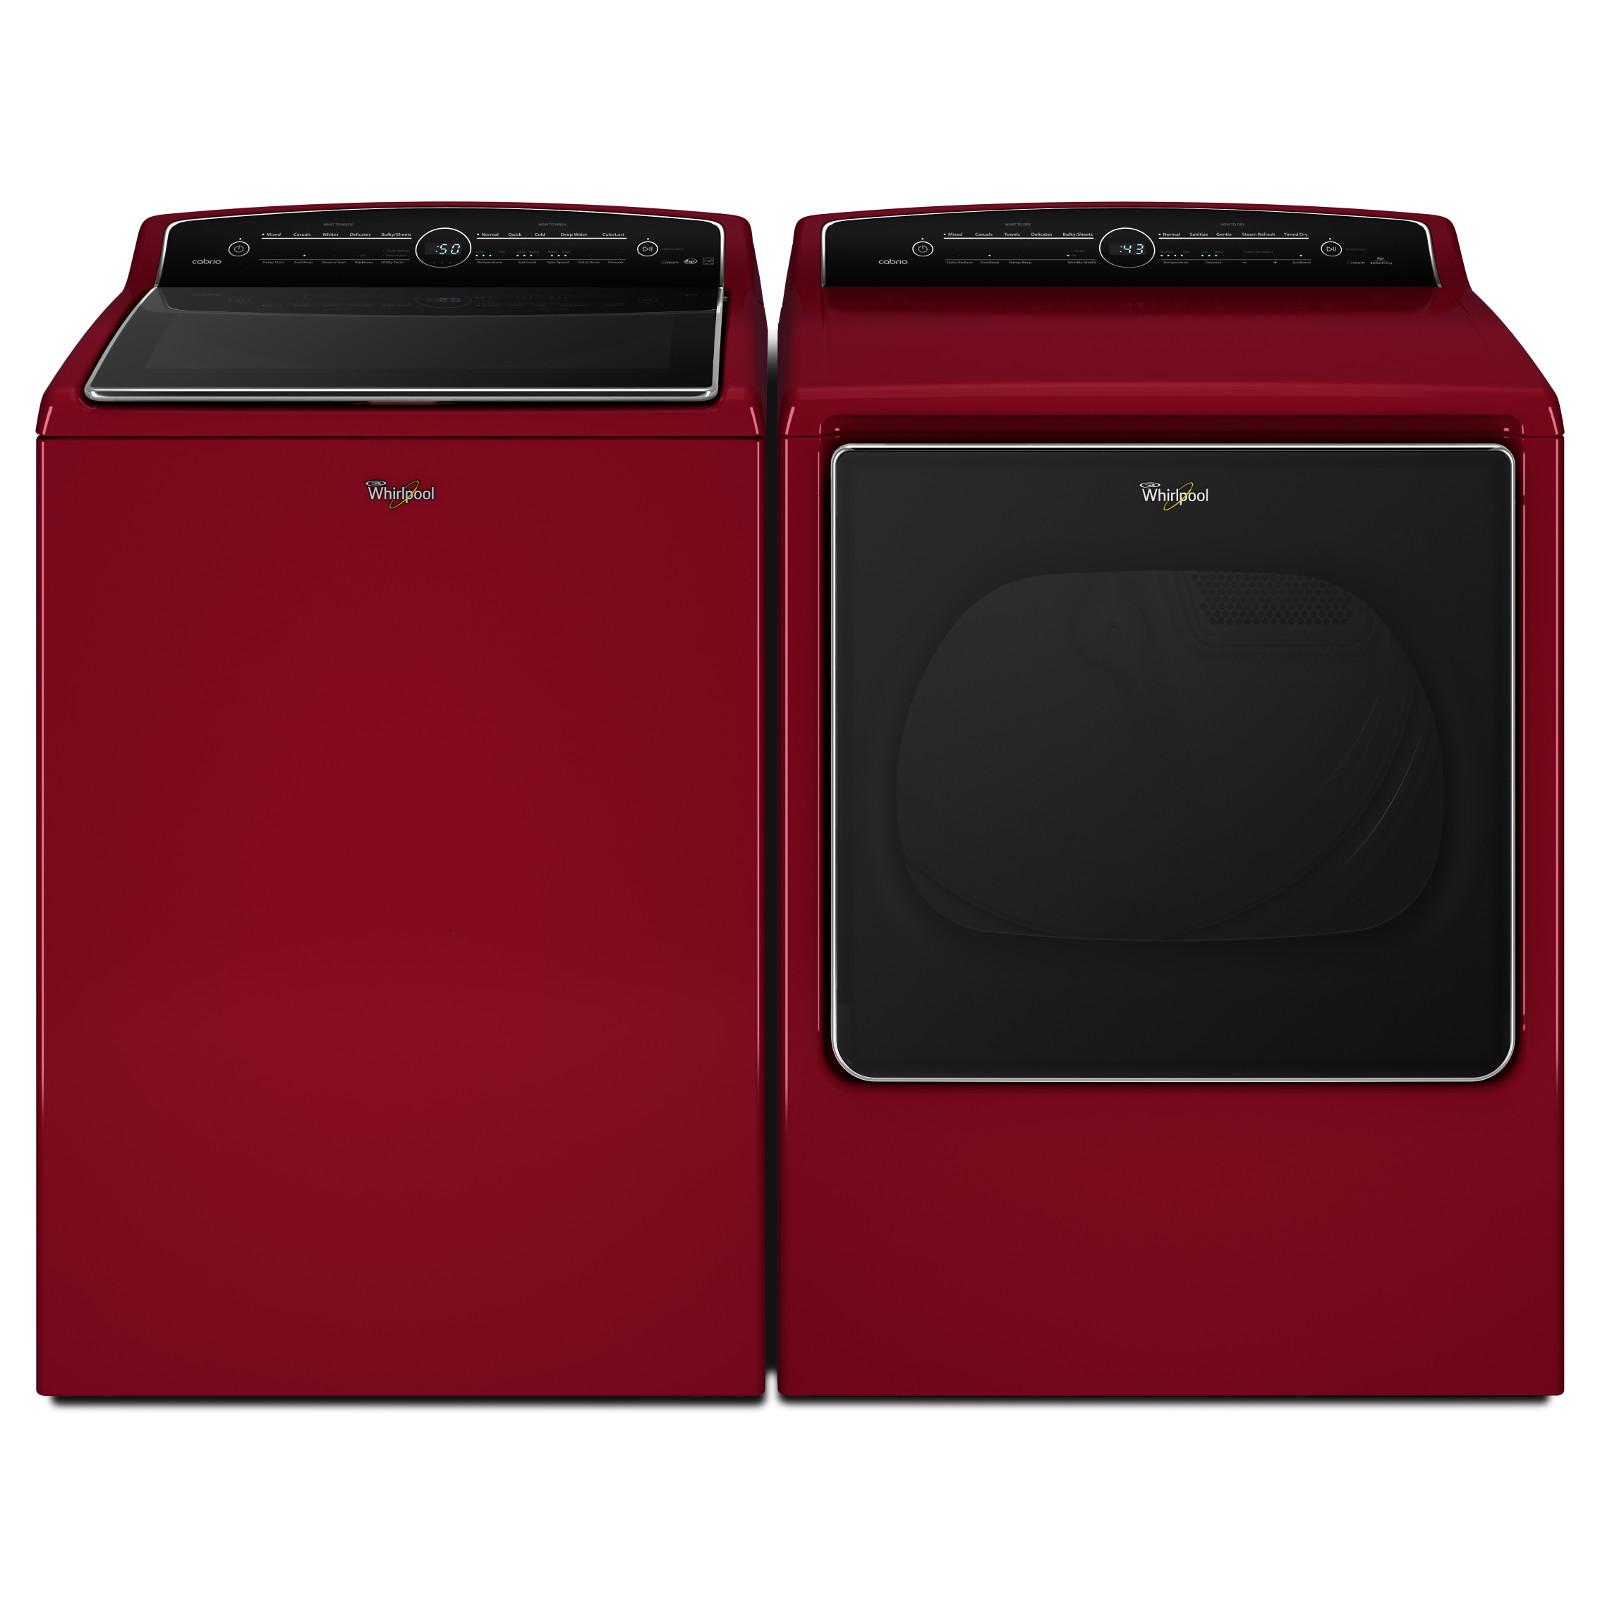 Whirlpool WGD8500DR 8.8 cu. ft. Cabrio® High-Efficiency Gas Steam Dryer - Cranberry Red